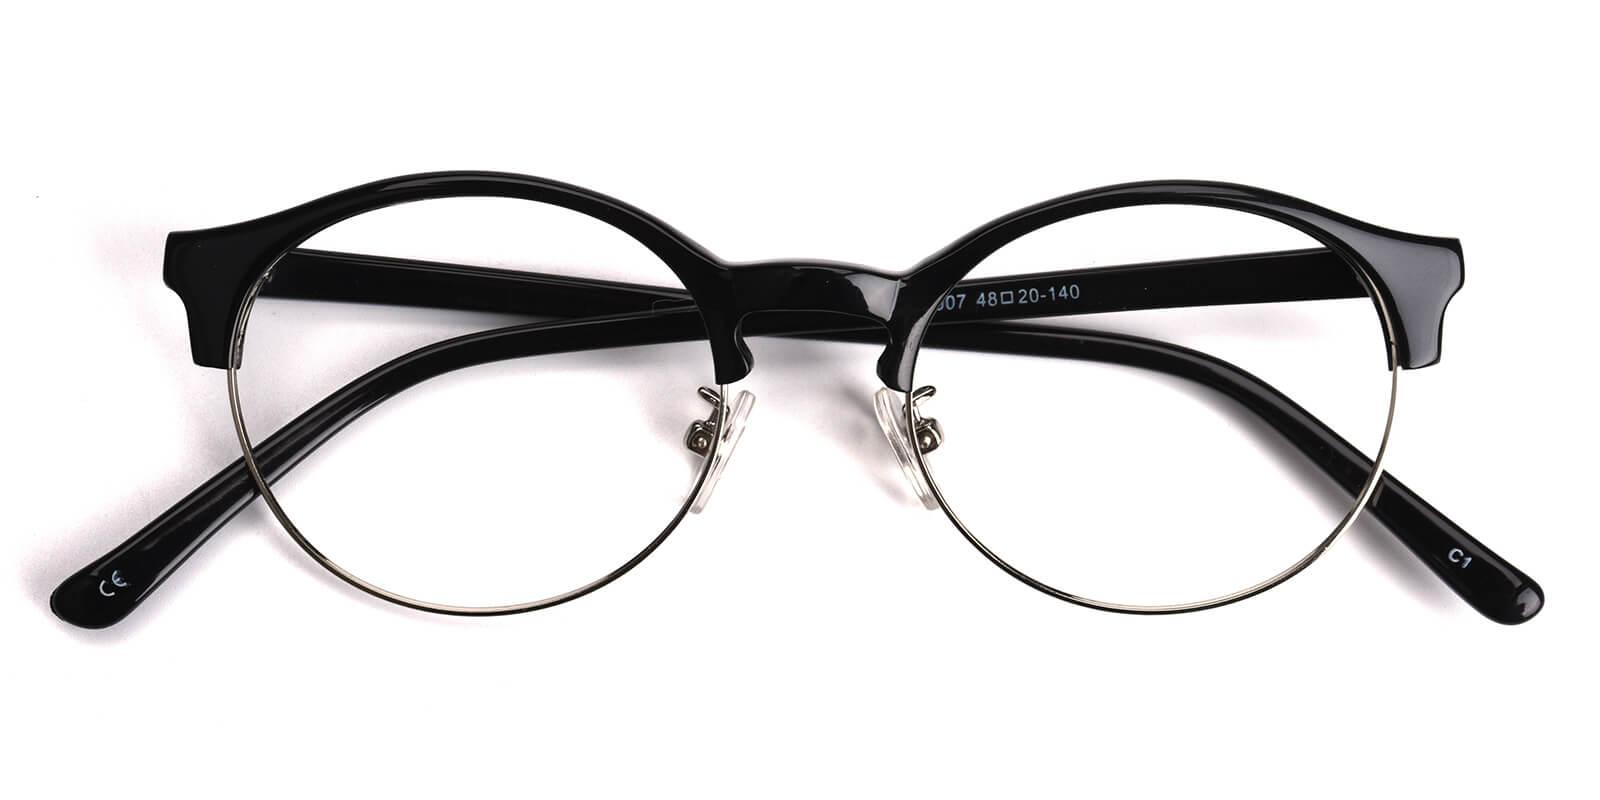 Zenoria-Black-Browline-Combination-Eyeglasses-detail